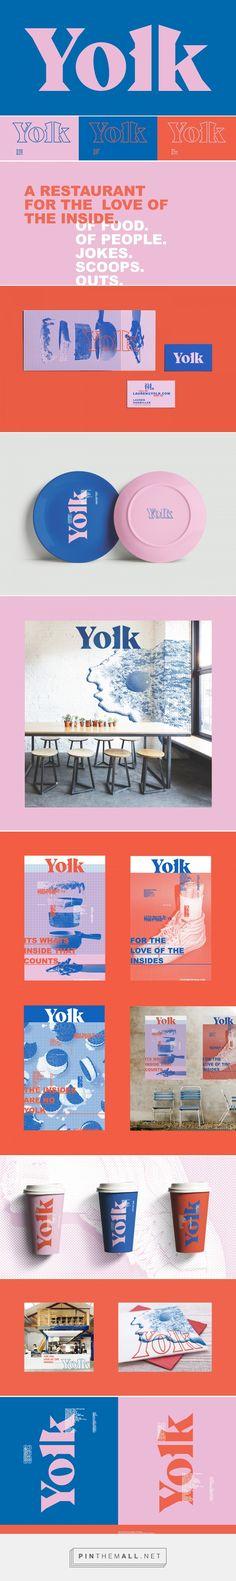 Yolk Restaurant Branding by Lauren Hakmiller | Fivestar Branding Agency – Design and Branding Agency & Curated Inspiration Gallery #restaurant #restaurantbranding #branding #brand #brandinginspiration #design